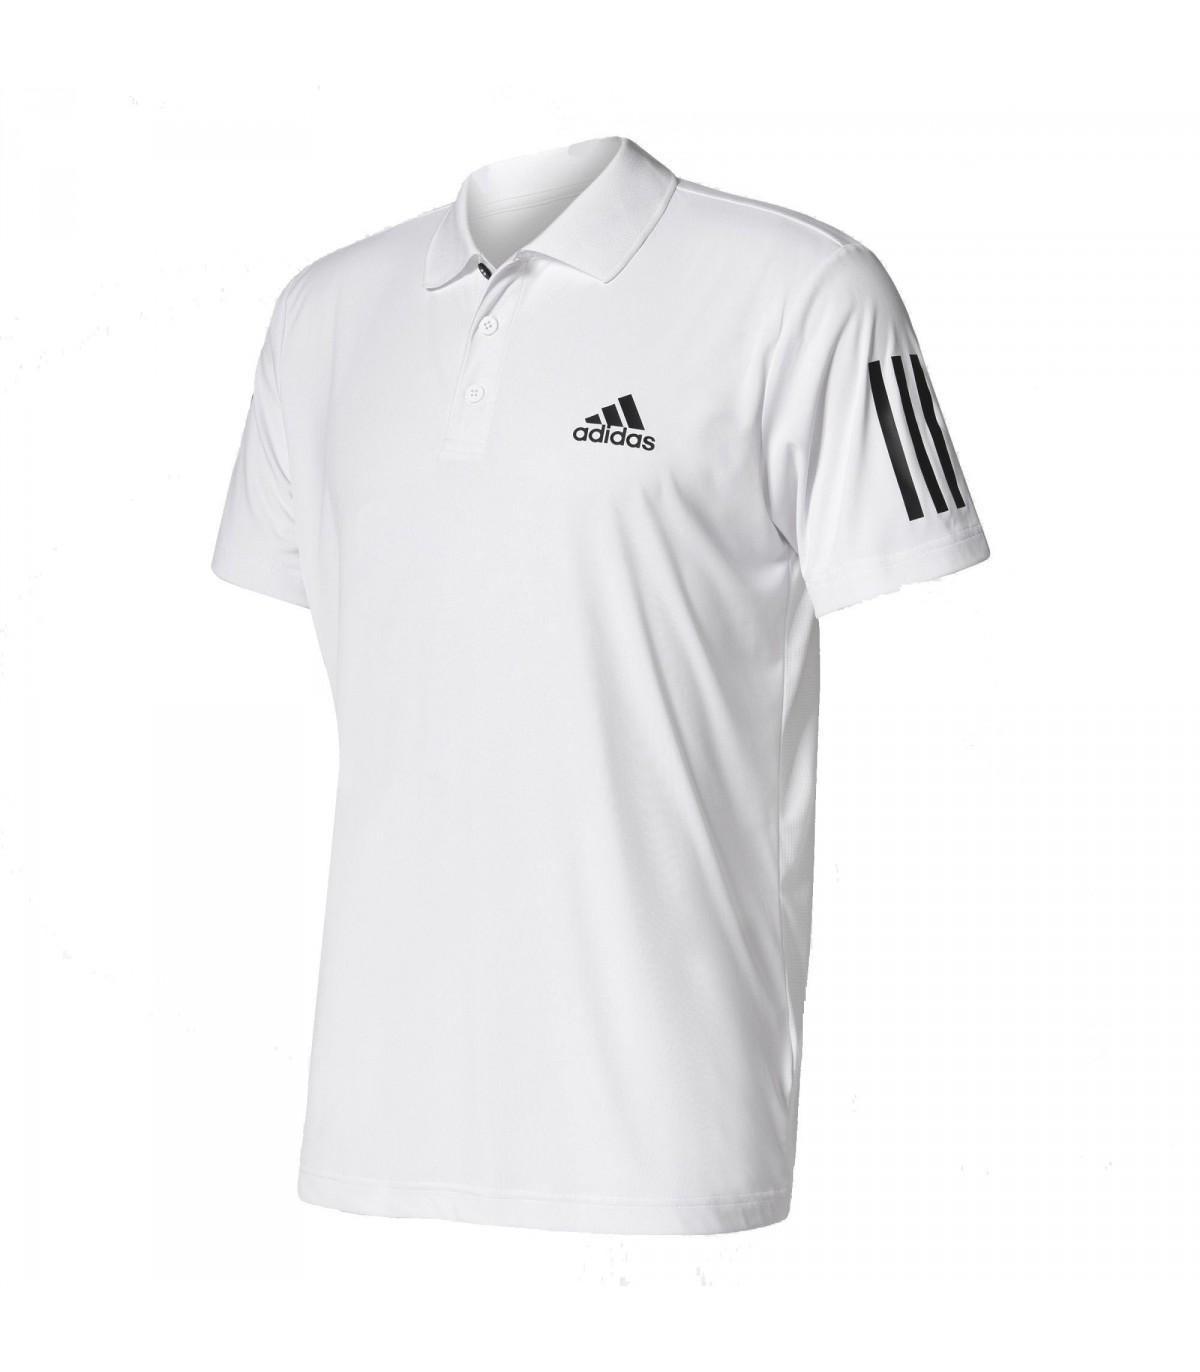 adidas - Polo - Homme Bois/blanc uqZjd6xNm